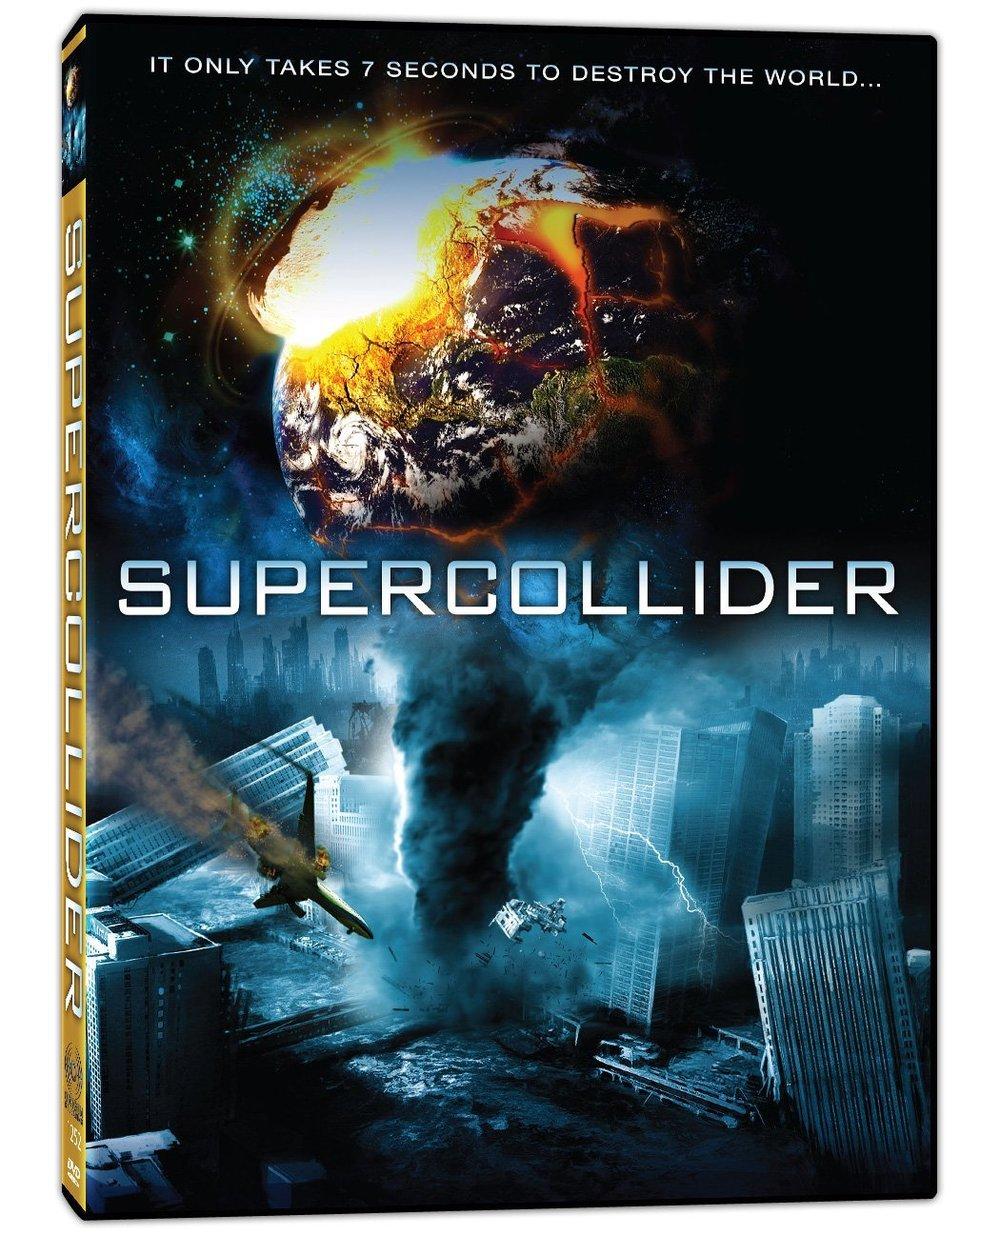 Supercollider - 2013